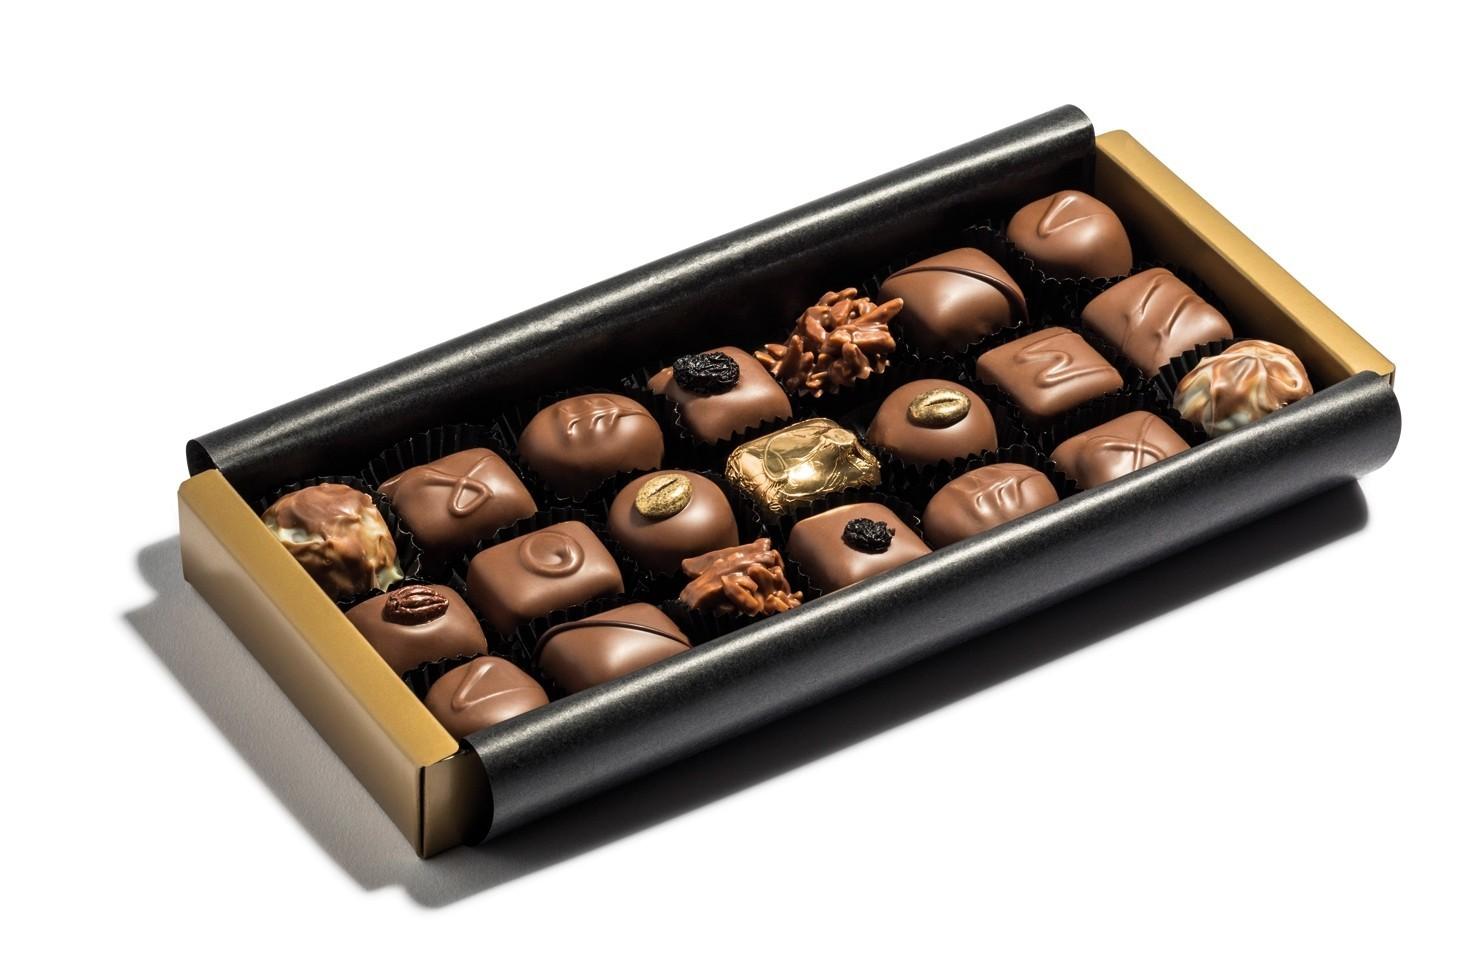 Assorted Milk Chocolates (21pcs) - $50.95